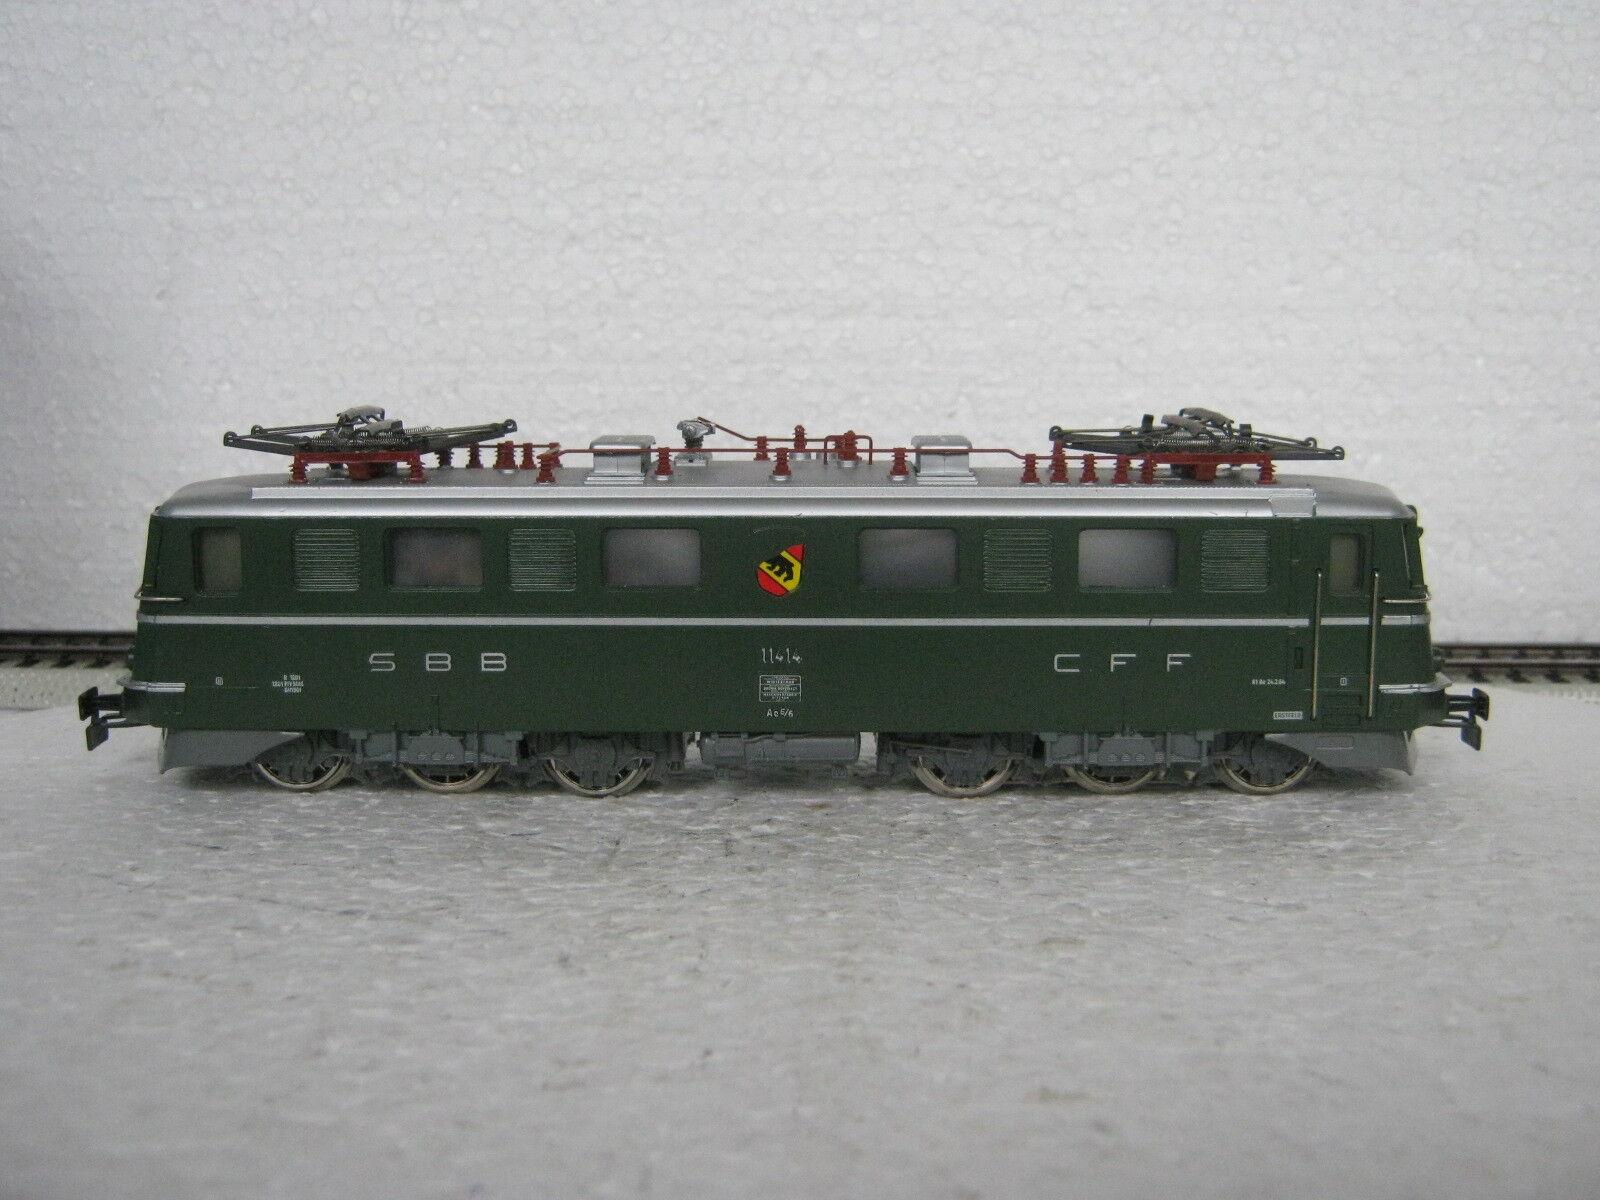 HO/AC 3050 e Lok AE 6/6 BR 11414 SBB  co/18-56r7/14